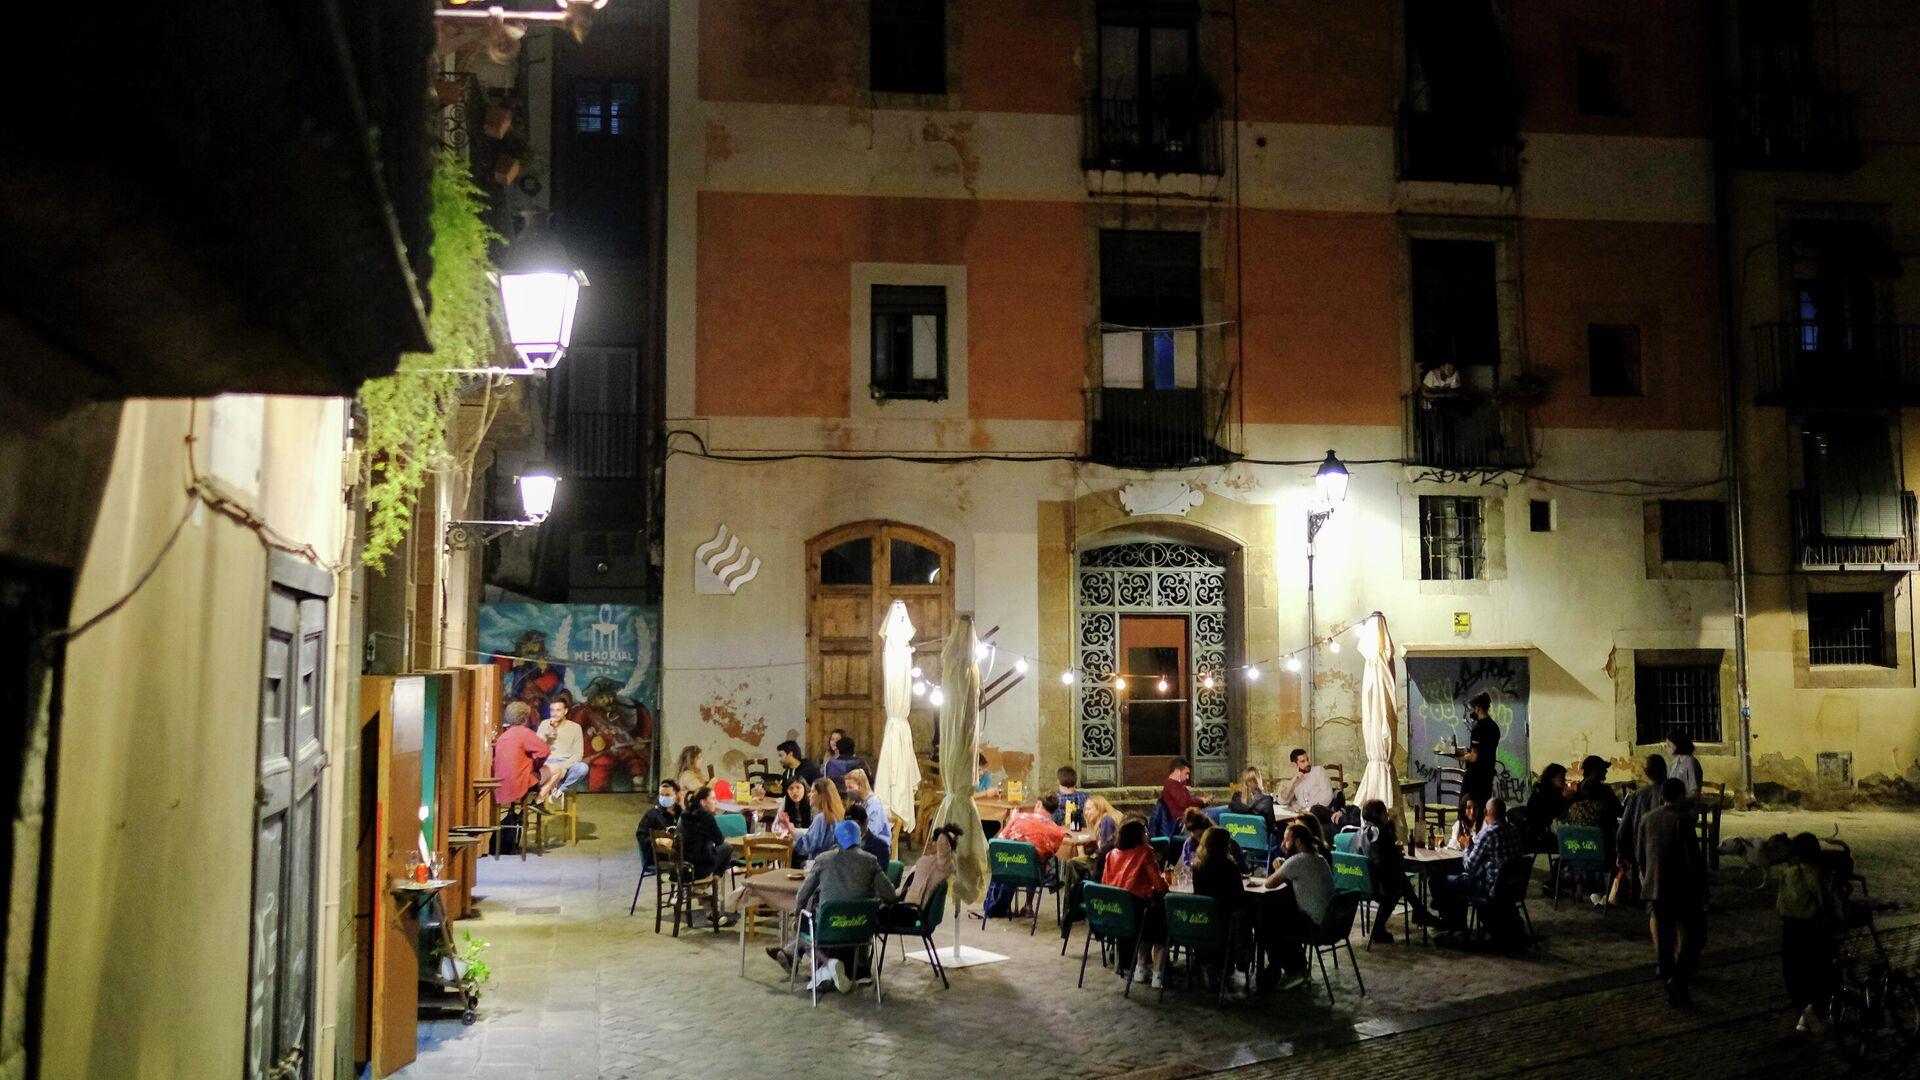 Un restaurante en Barcelona - Sputnik Mundo, 1920, 17.05.2021